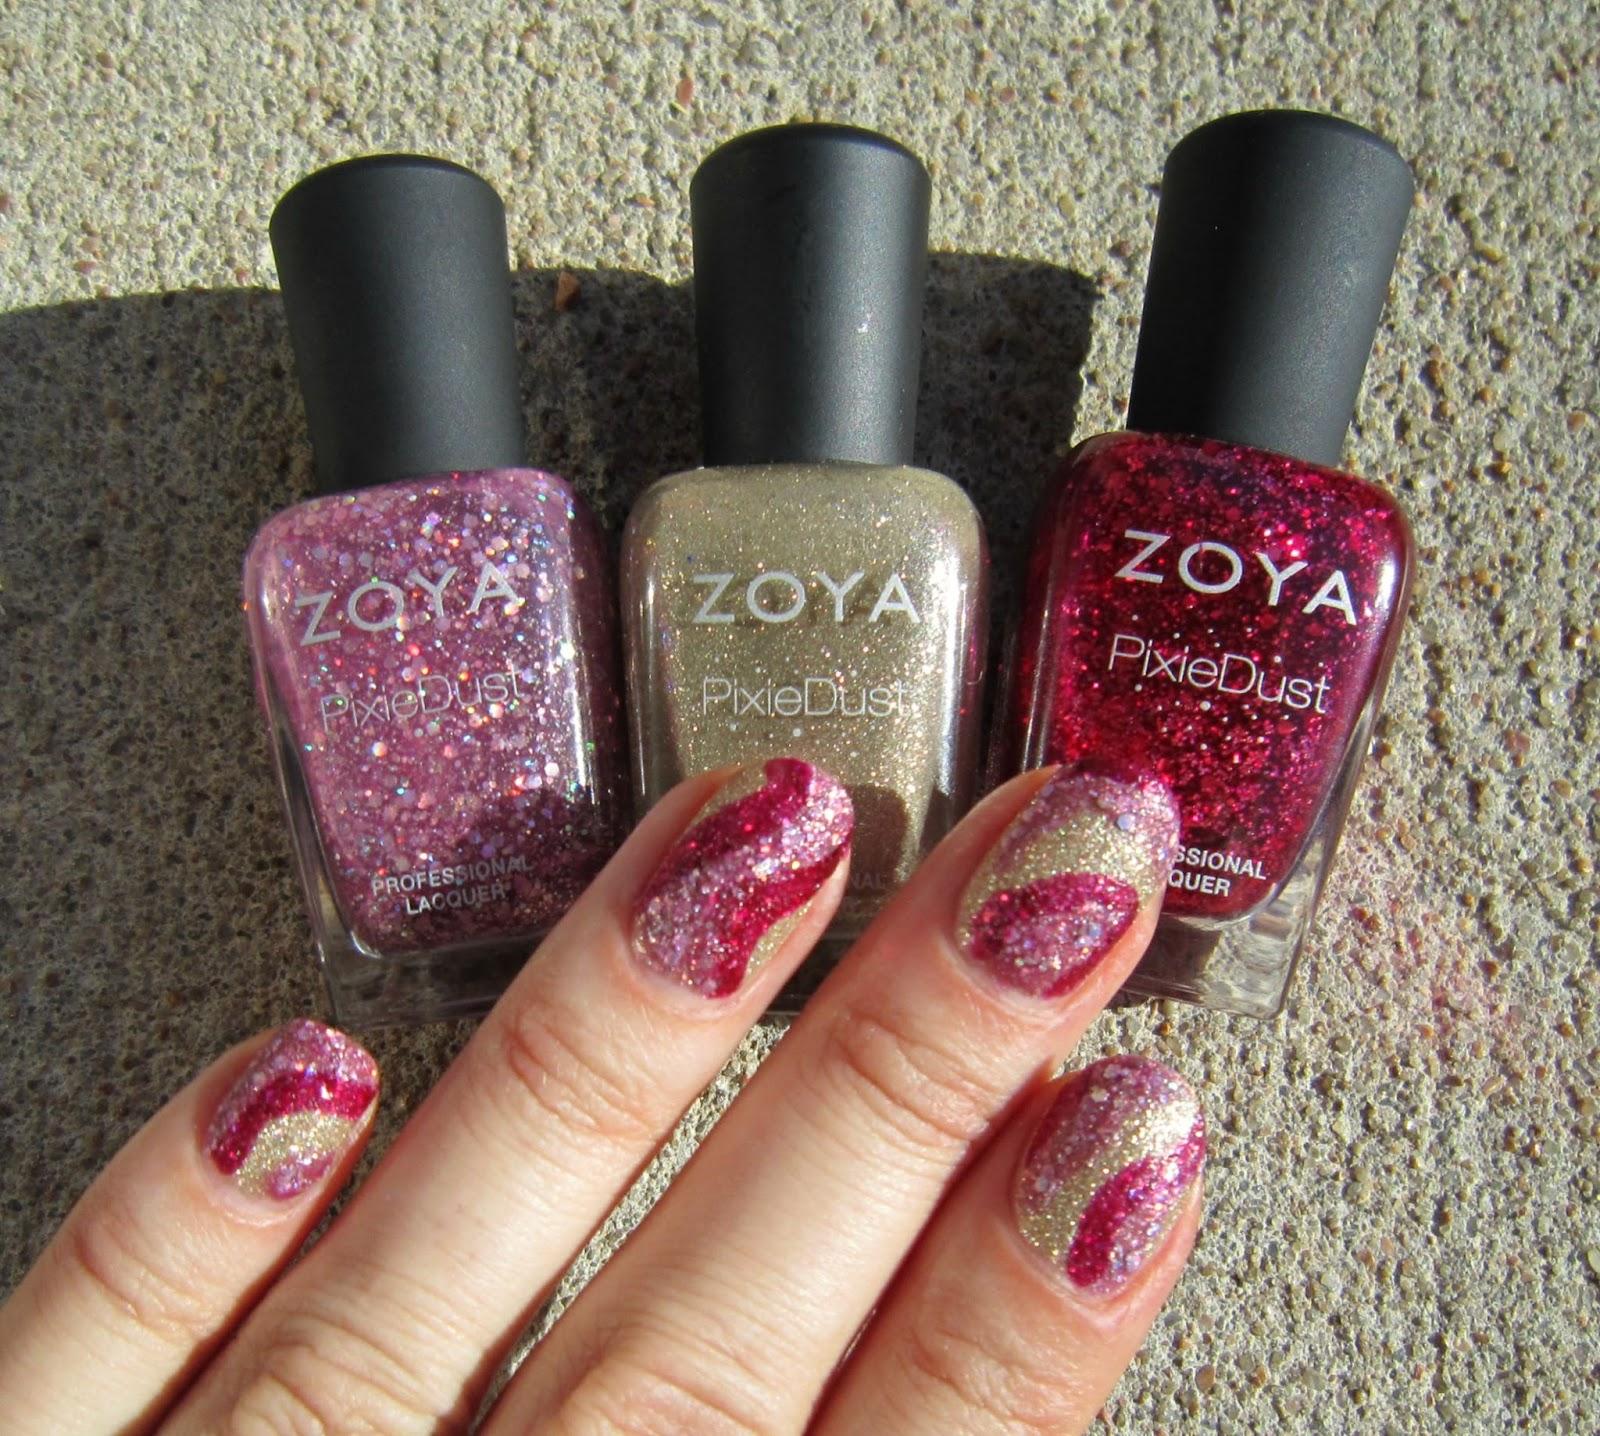 Concrete and Nail Polish: Nail Art With Zoya Pixie Dust